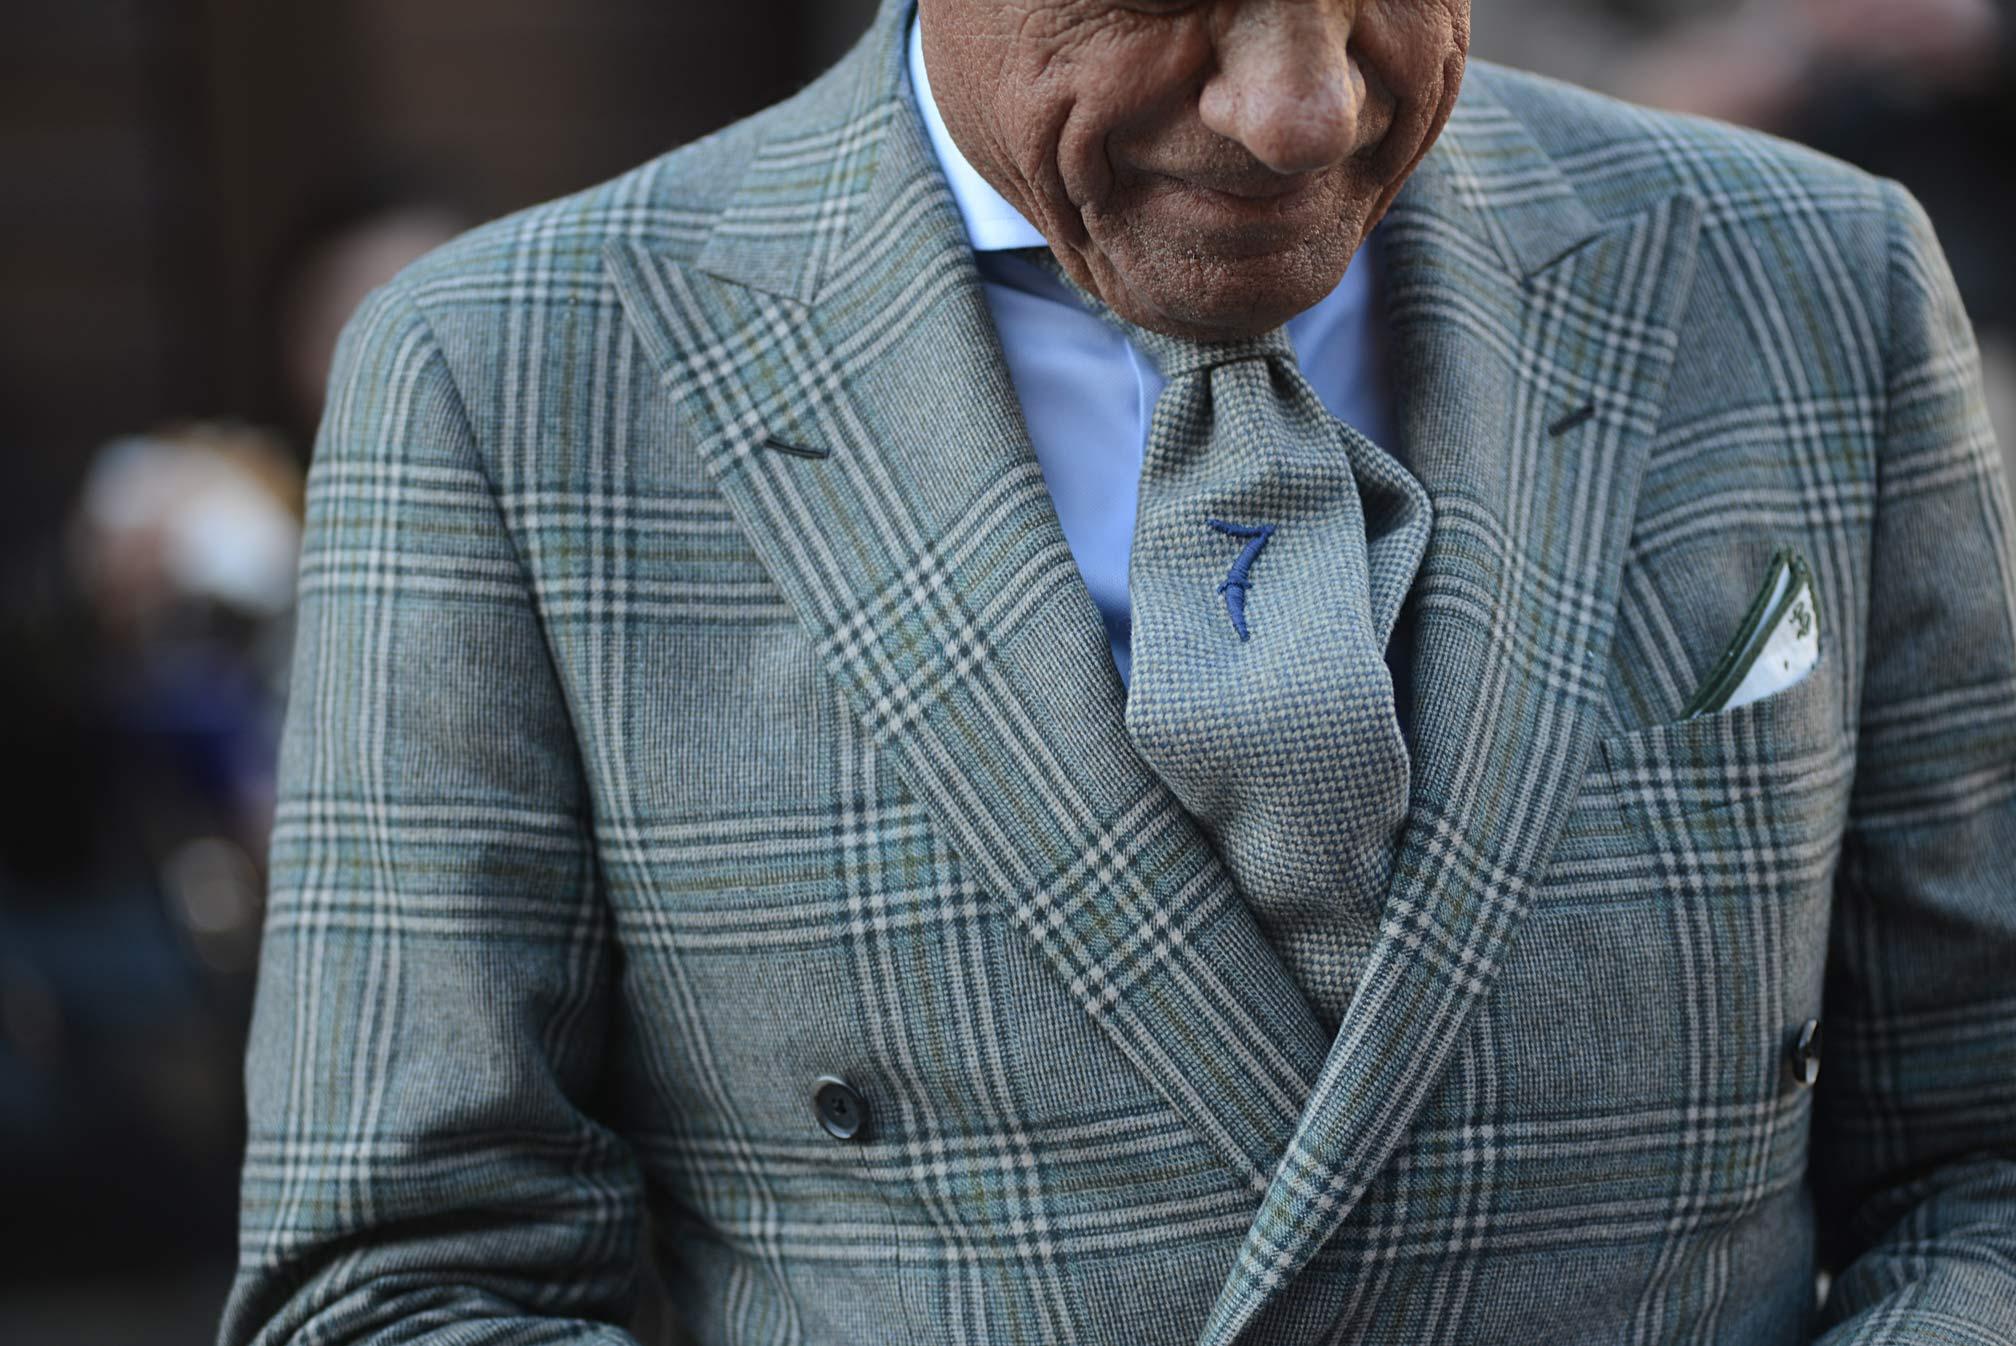 Lino-Ieluzzio-Guerreisms-Winter-coat